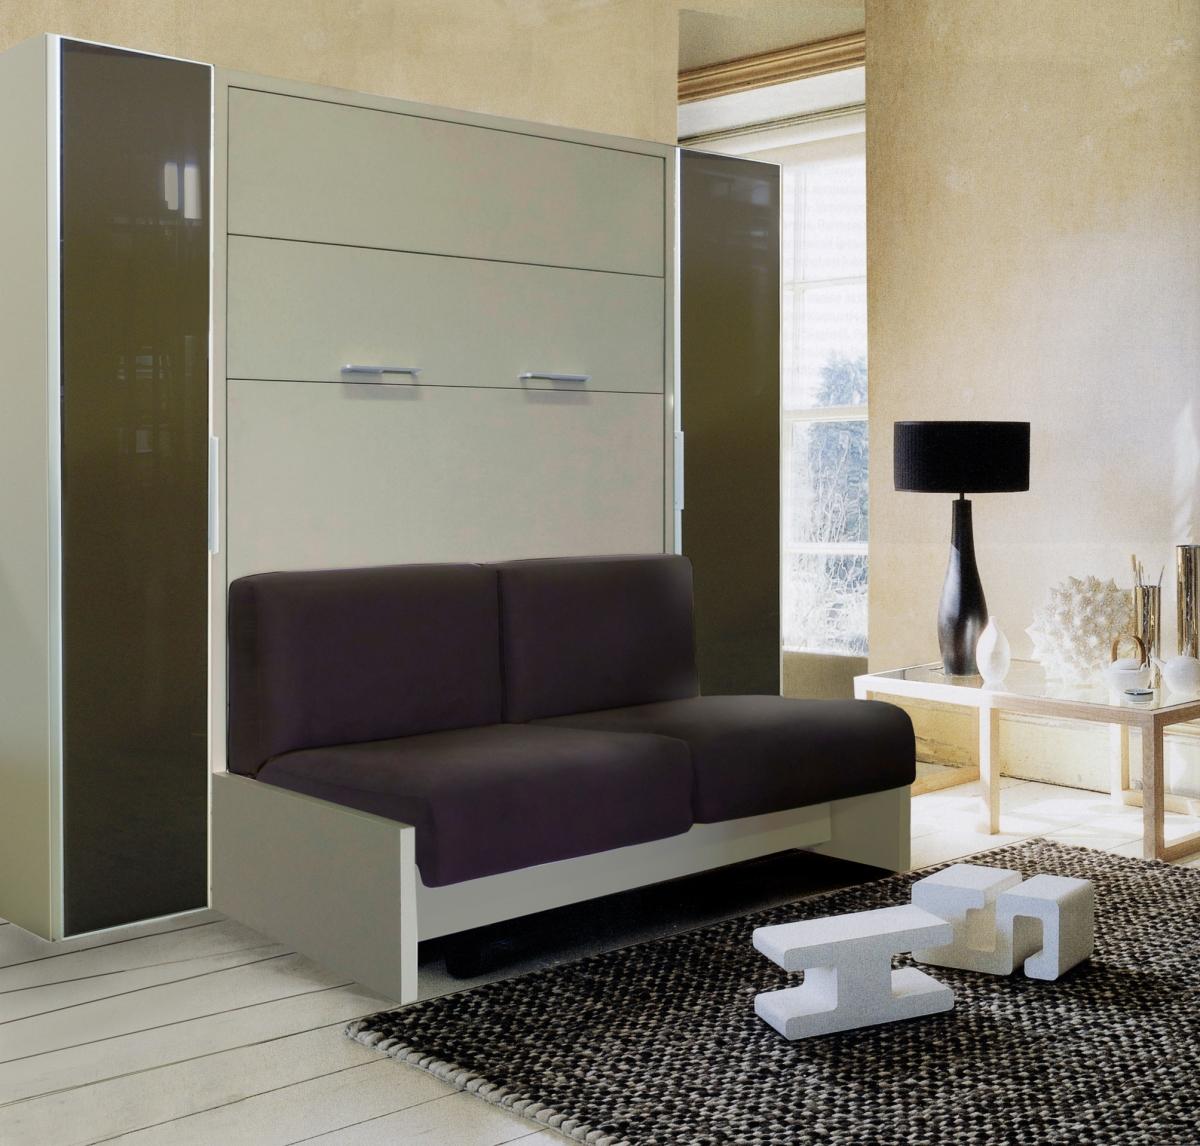 lit escamotable canape occasion maison design. Black Bedroom Furniture Sets. Home Design Ideas